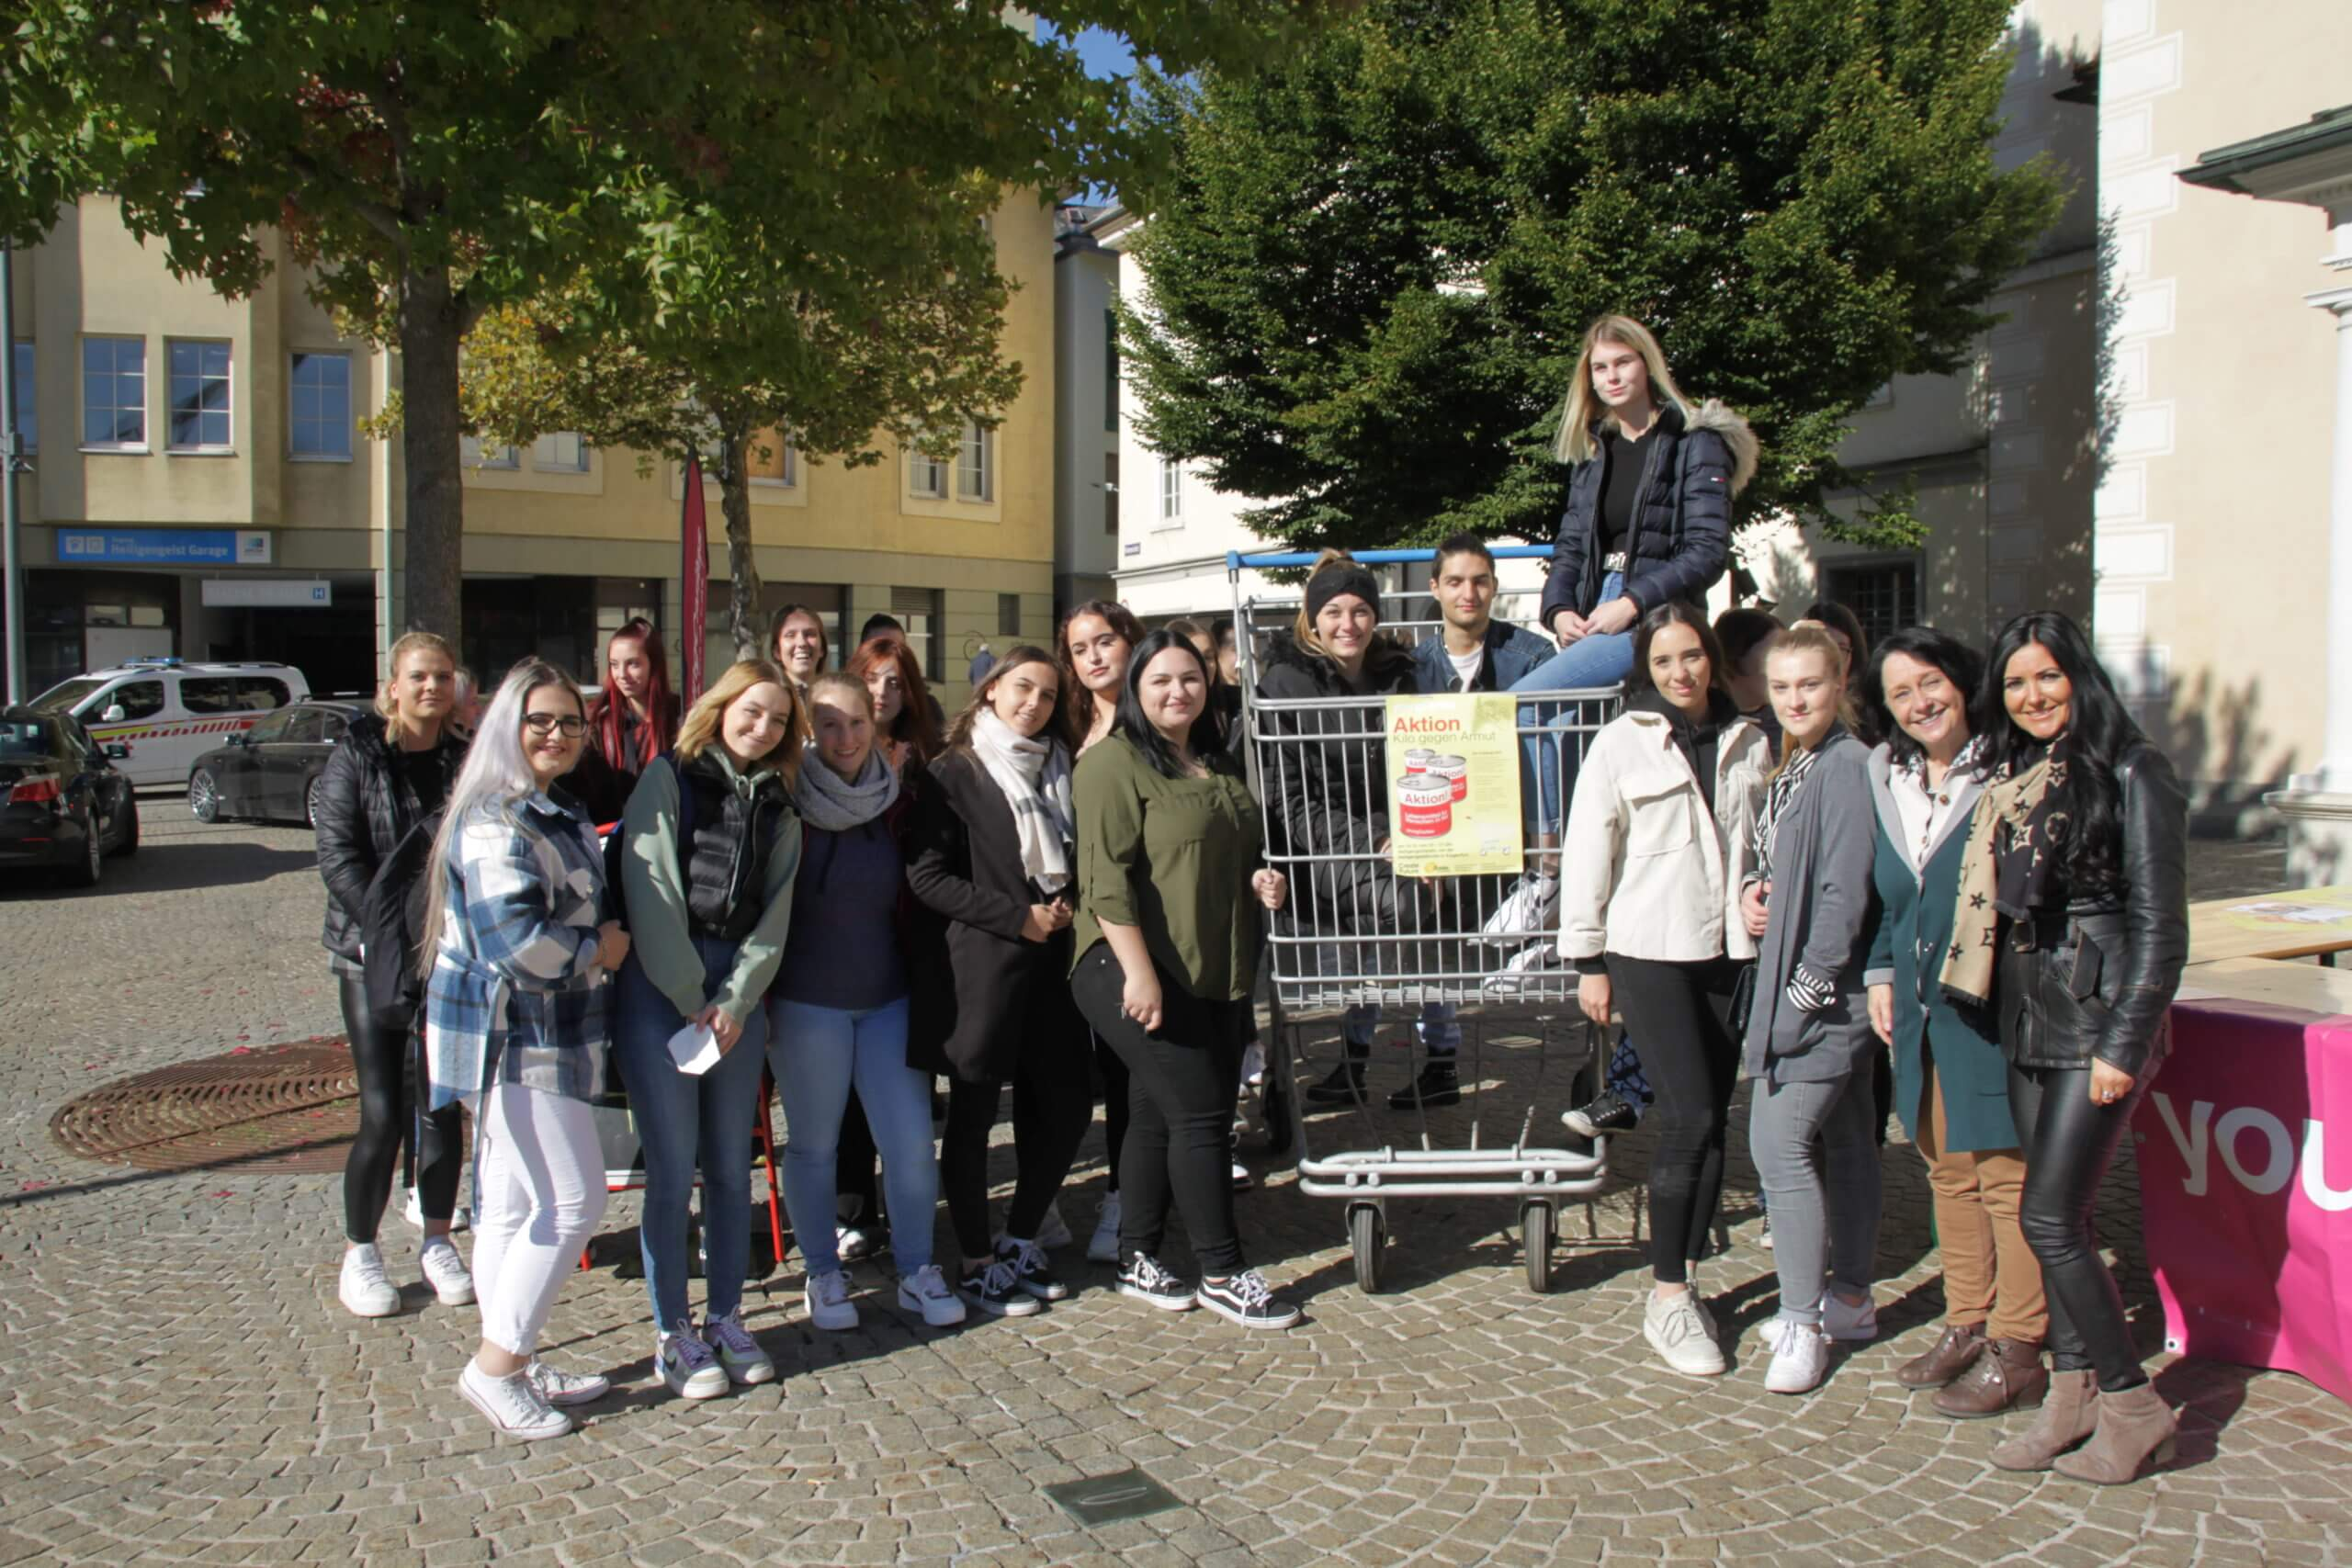 Aktion Kilo 2021 Berufsschule St. Veit